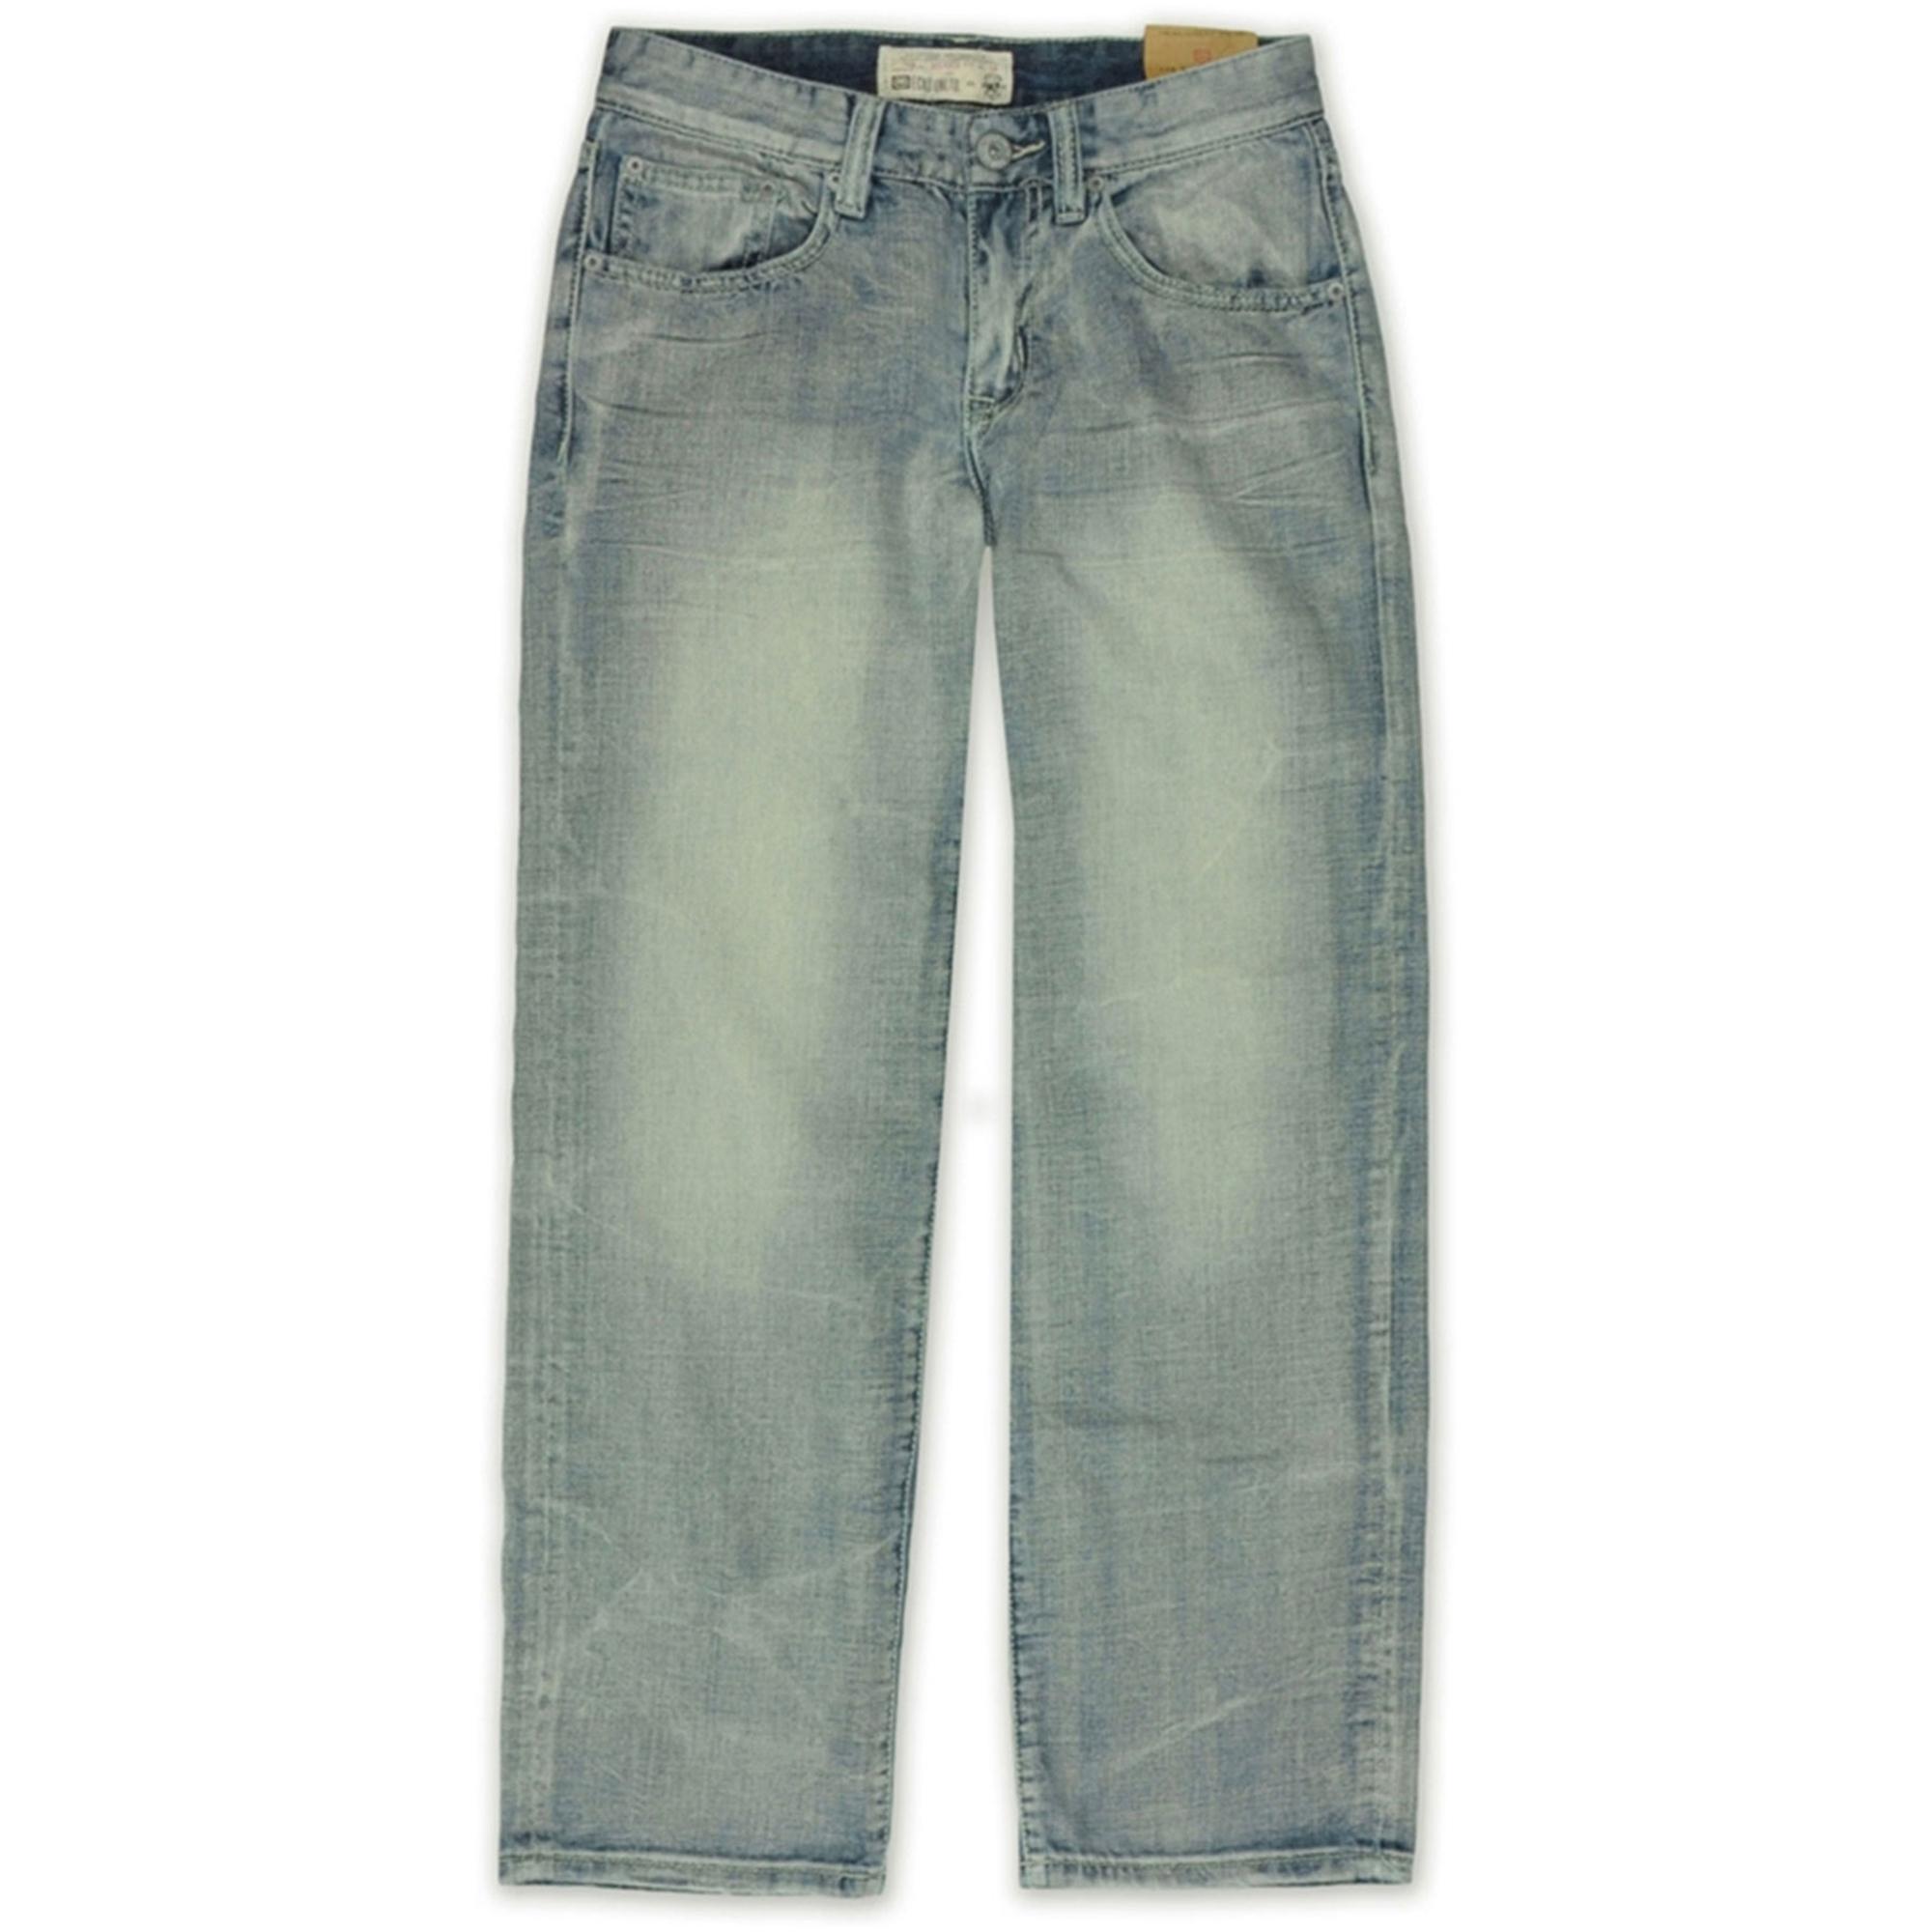 Ecko Unltd. Mens Core Crystal Wash Denim Relaxed Jeans